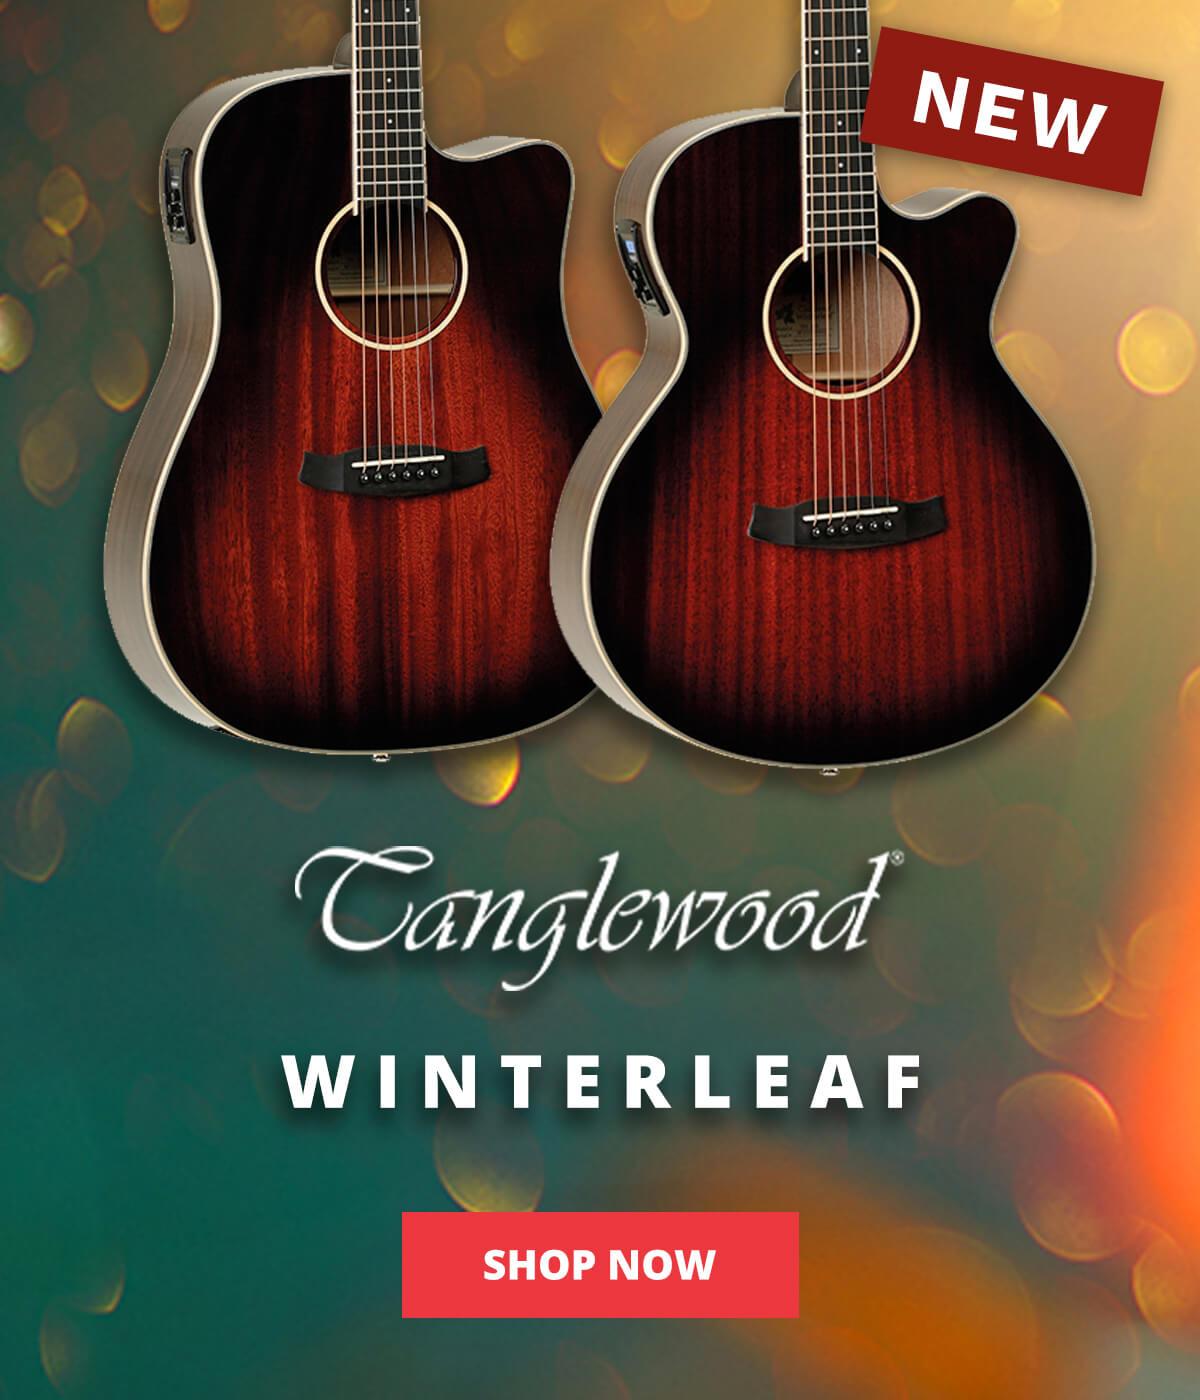 New 2021 Tanglewood electro-acoustics - shop now!